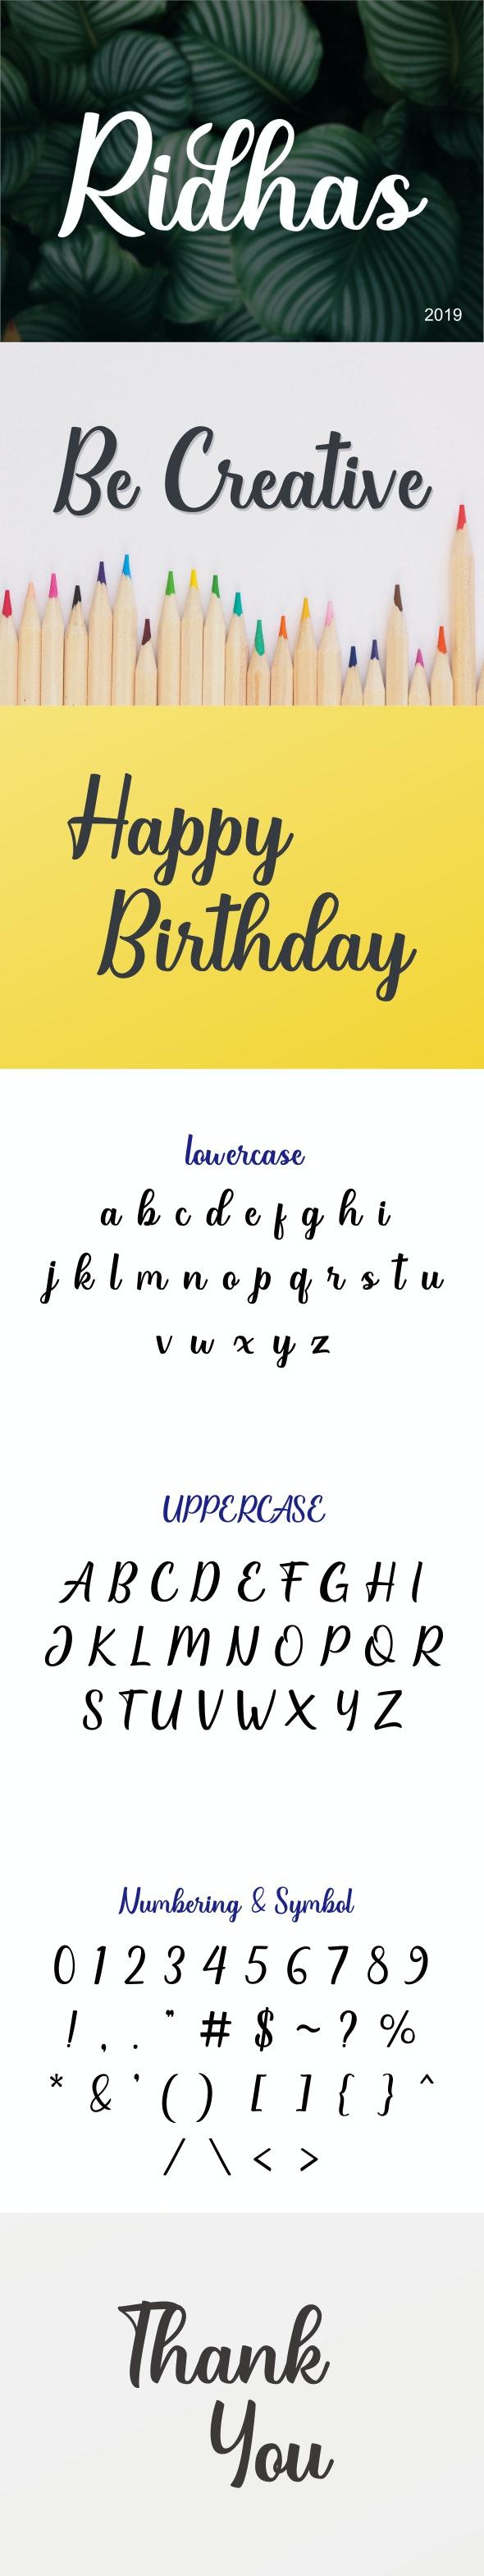 Ridhas - Handwriting Fonts